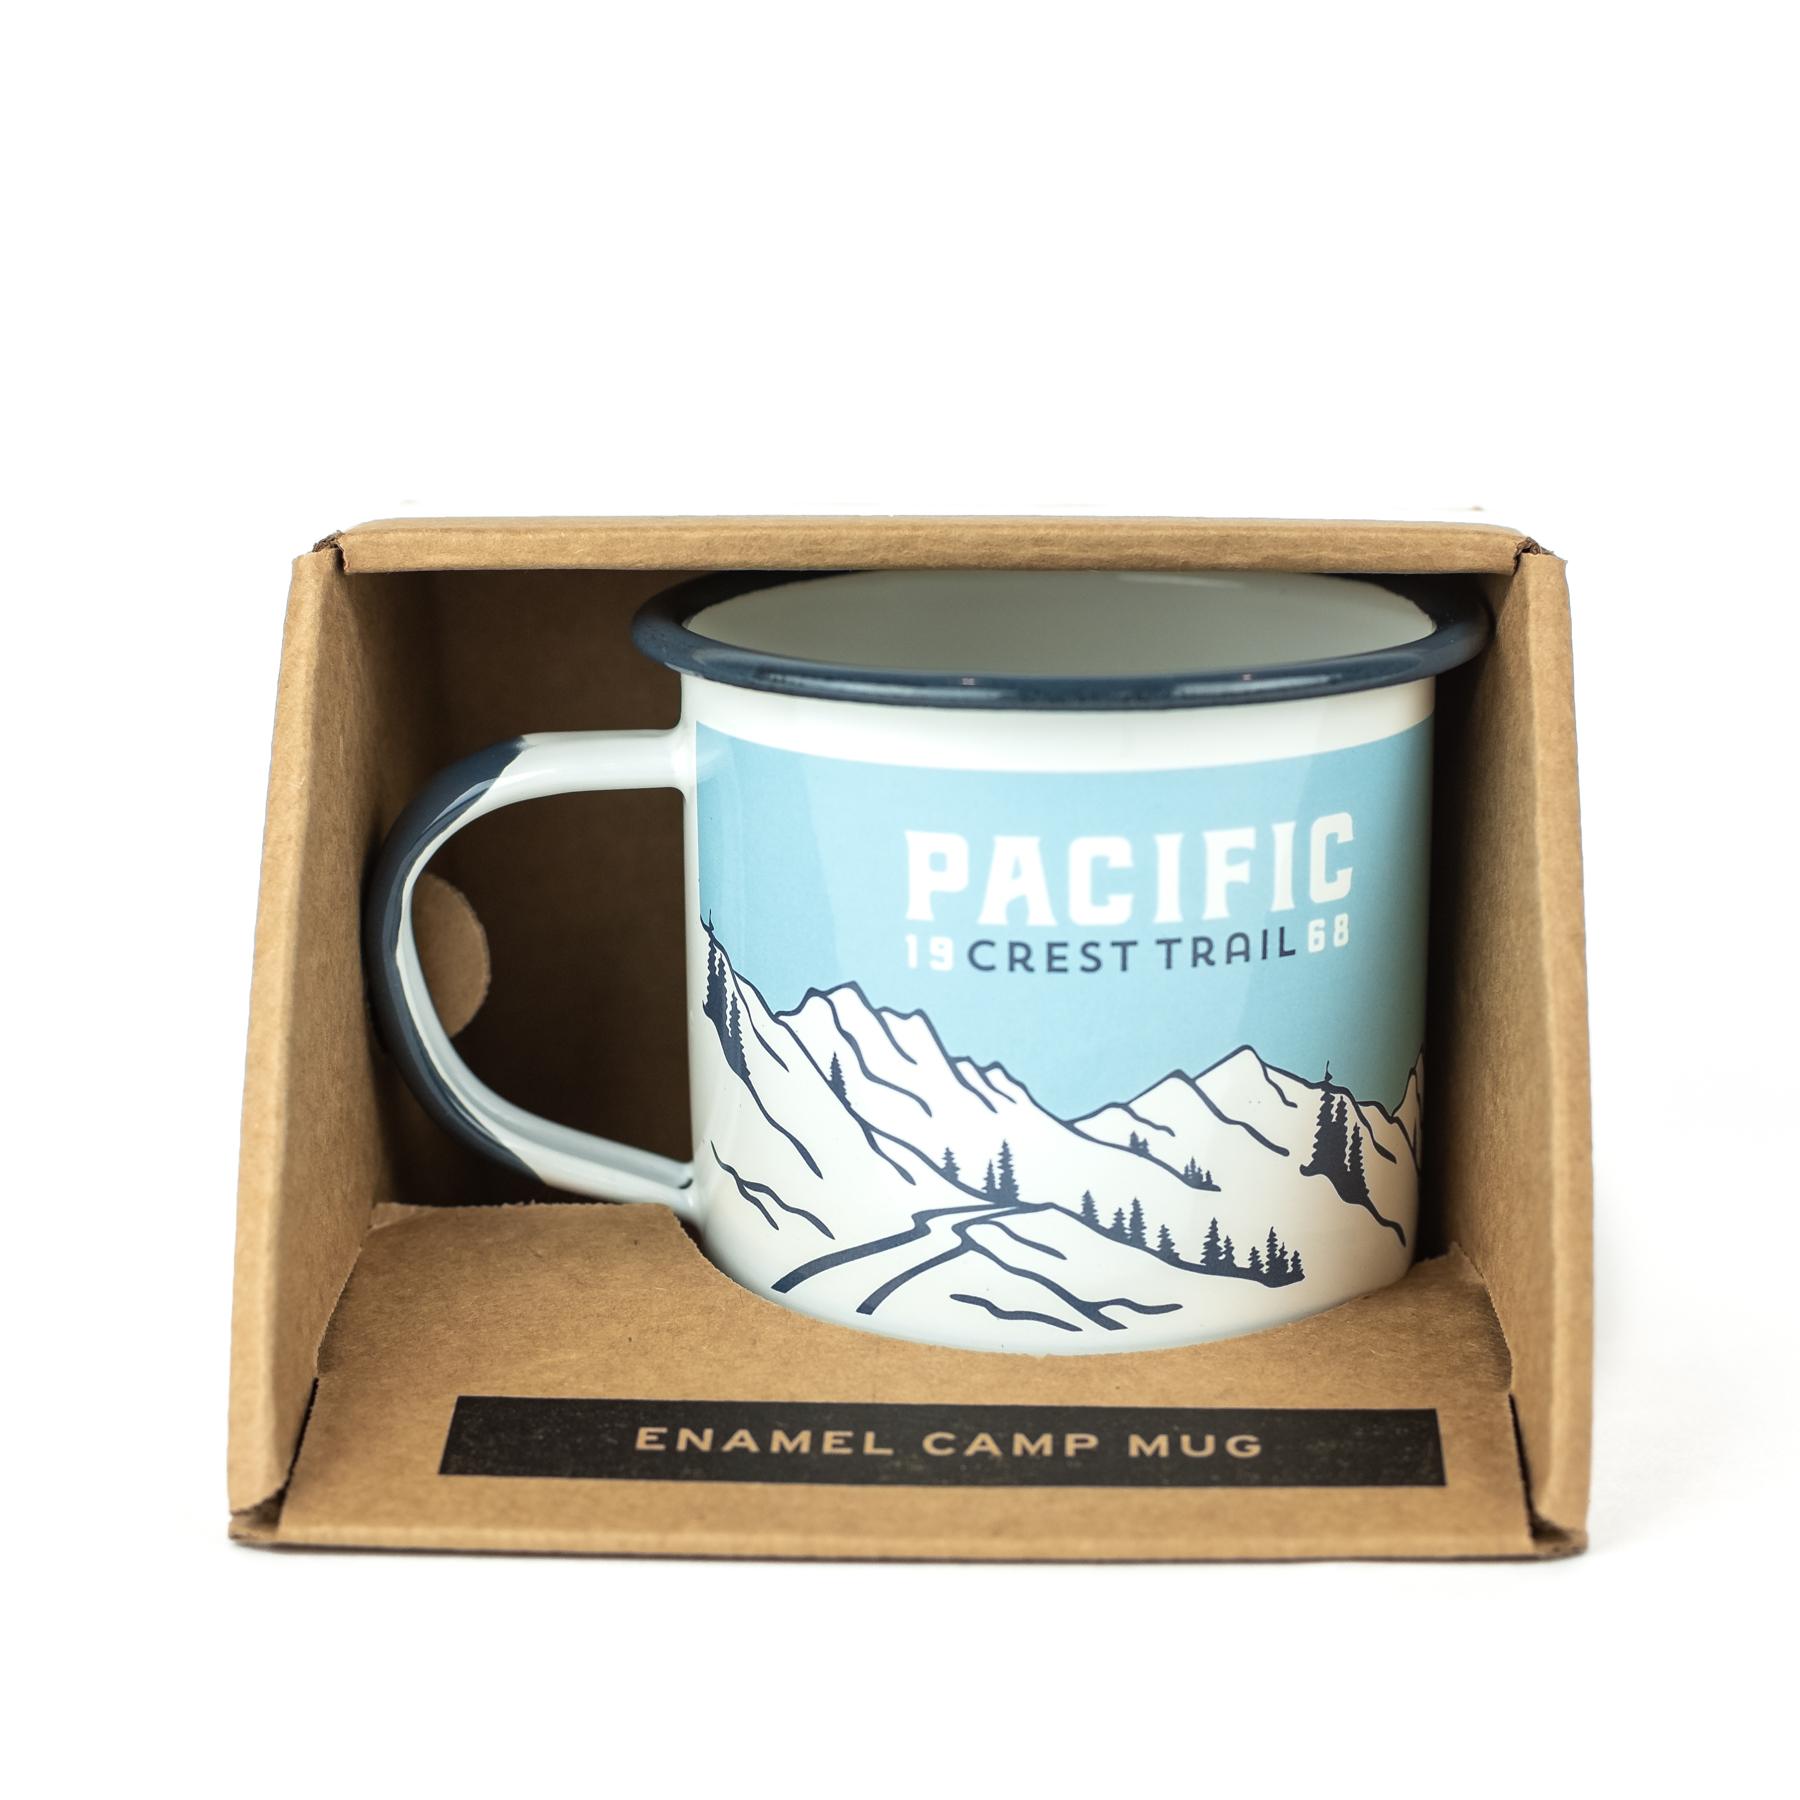 pacific-crest-trail-mug-1.jpg